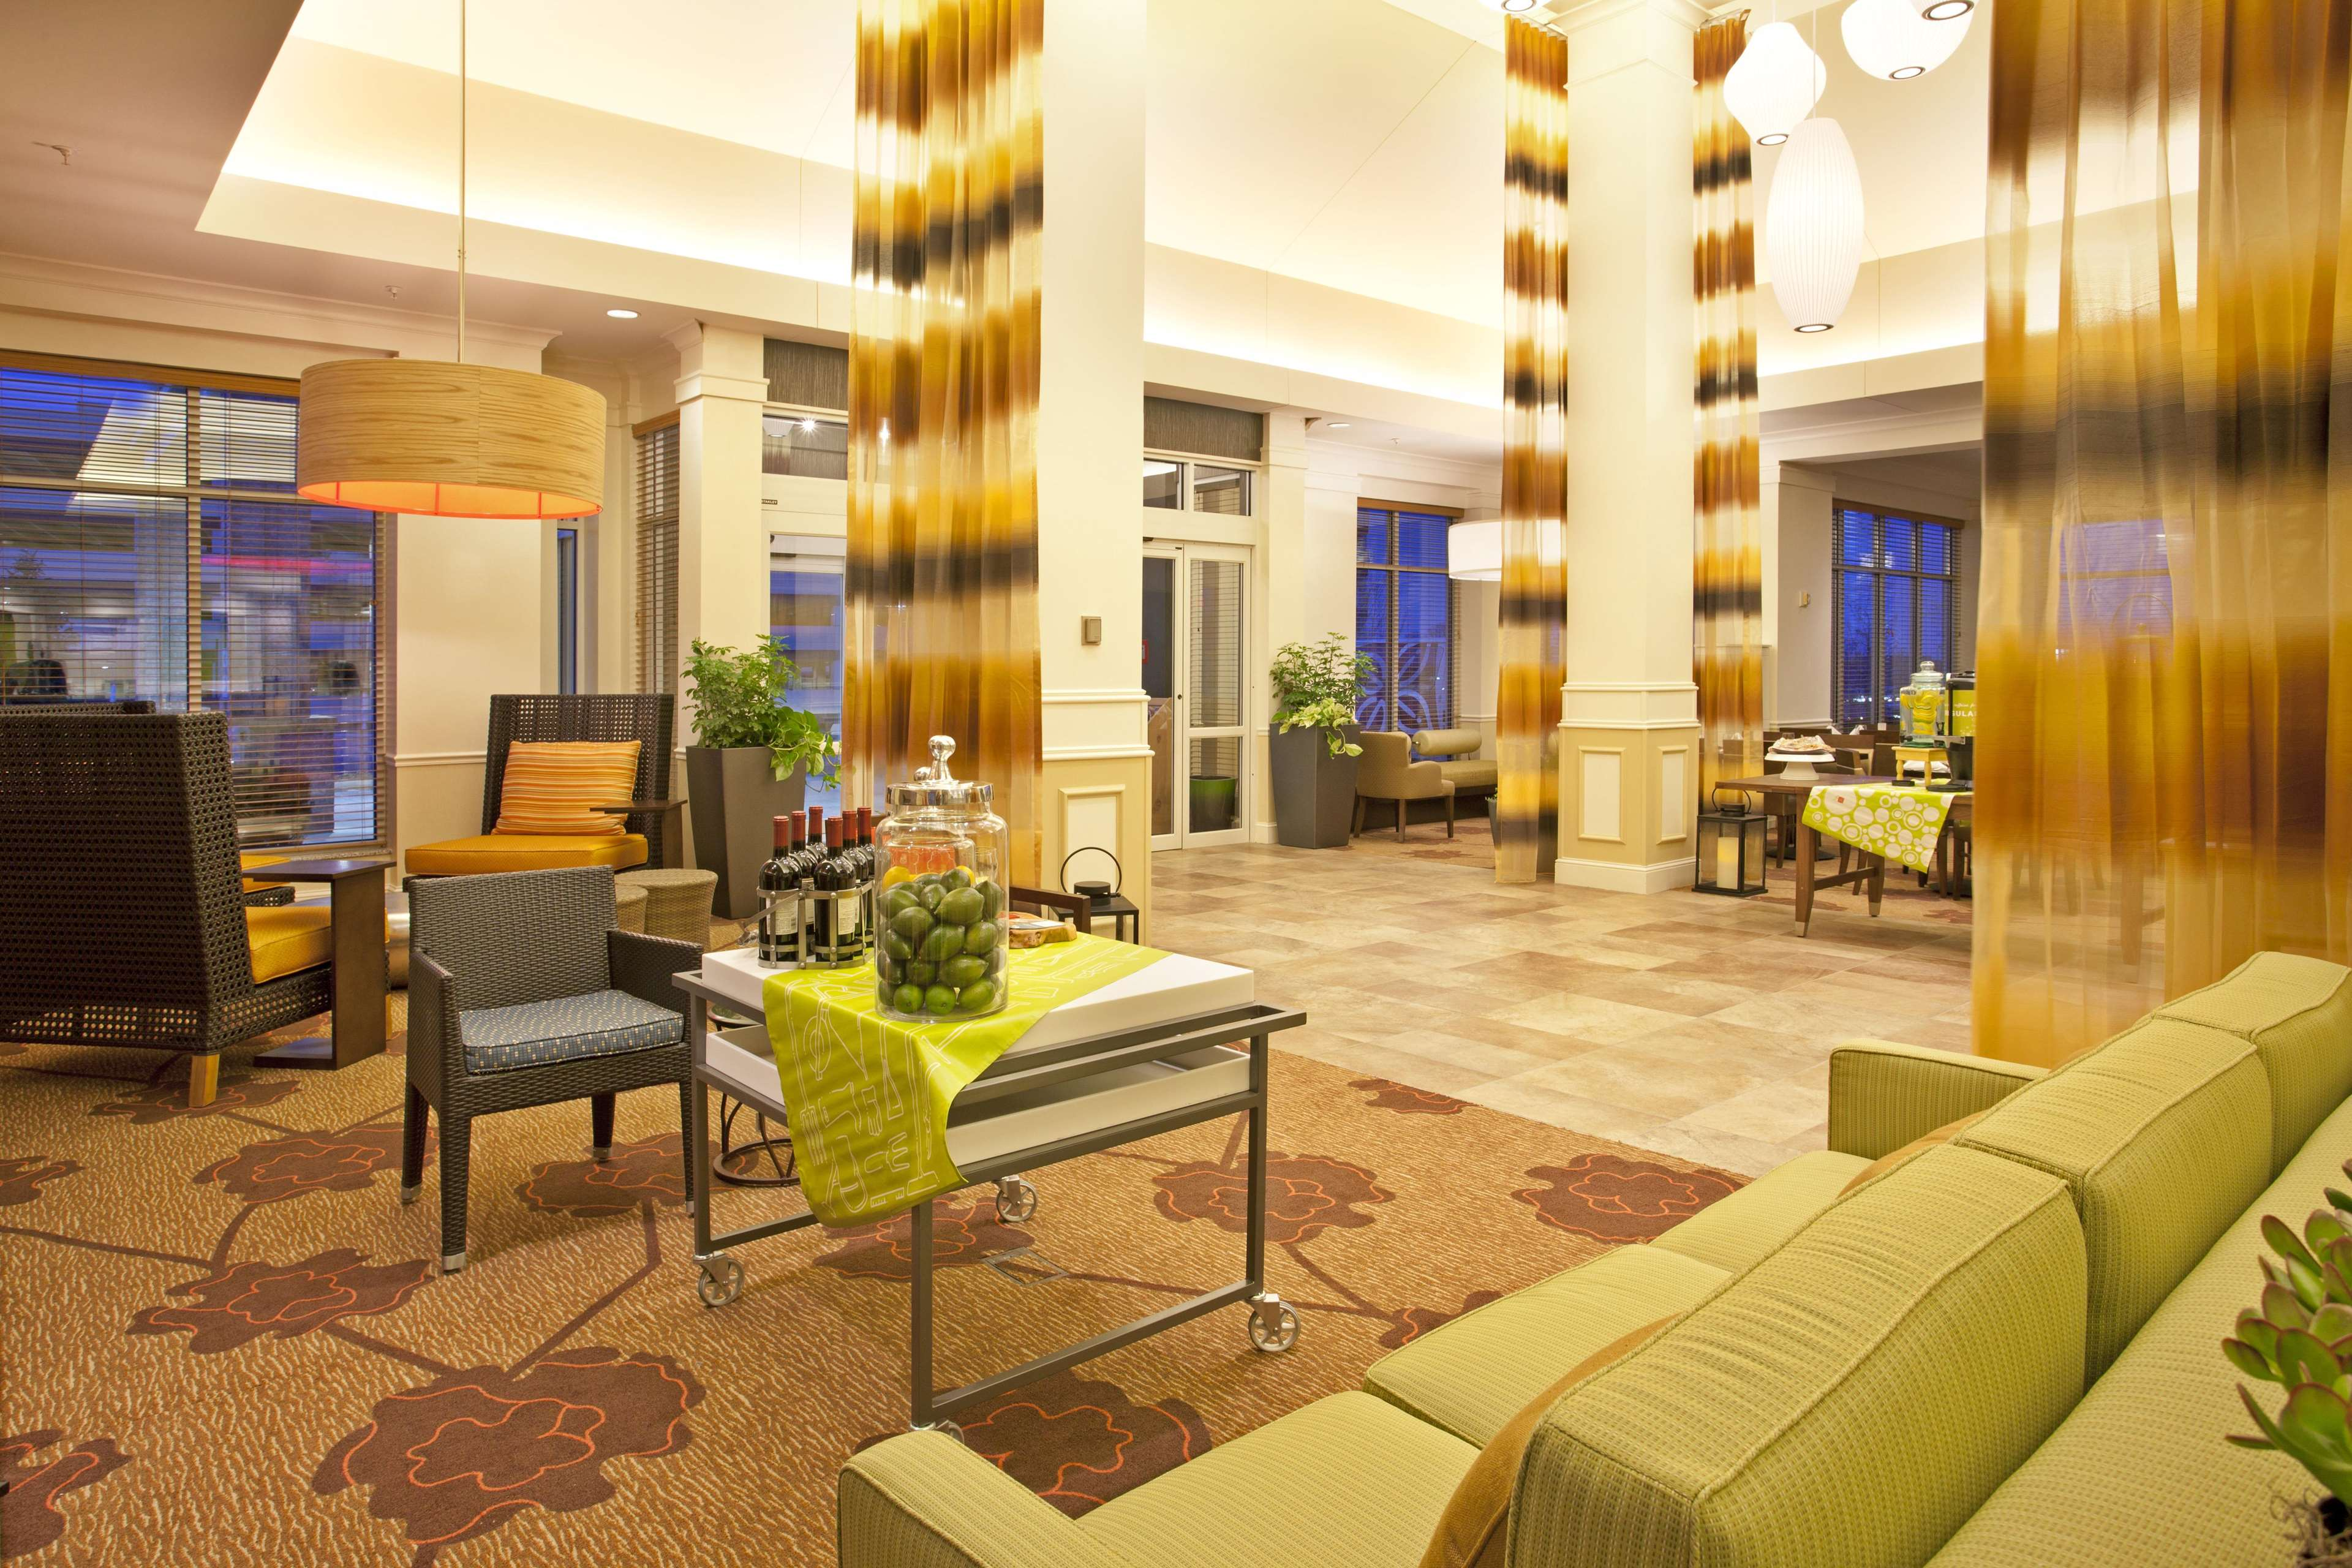 Hilton Garden Inn Minneapolis/Eden Prairie